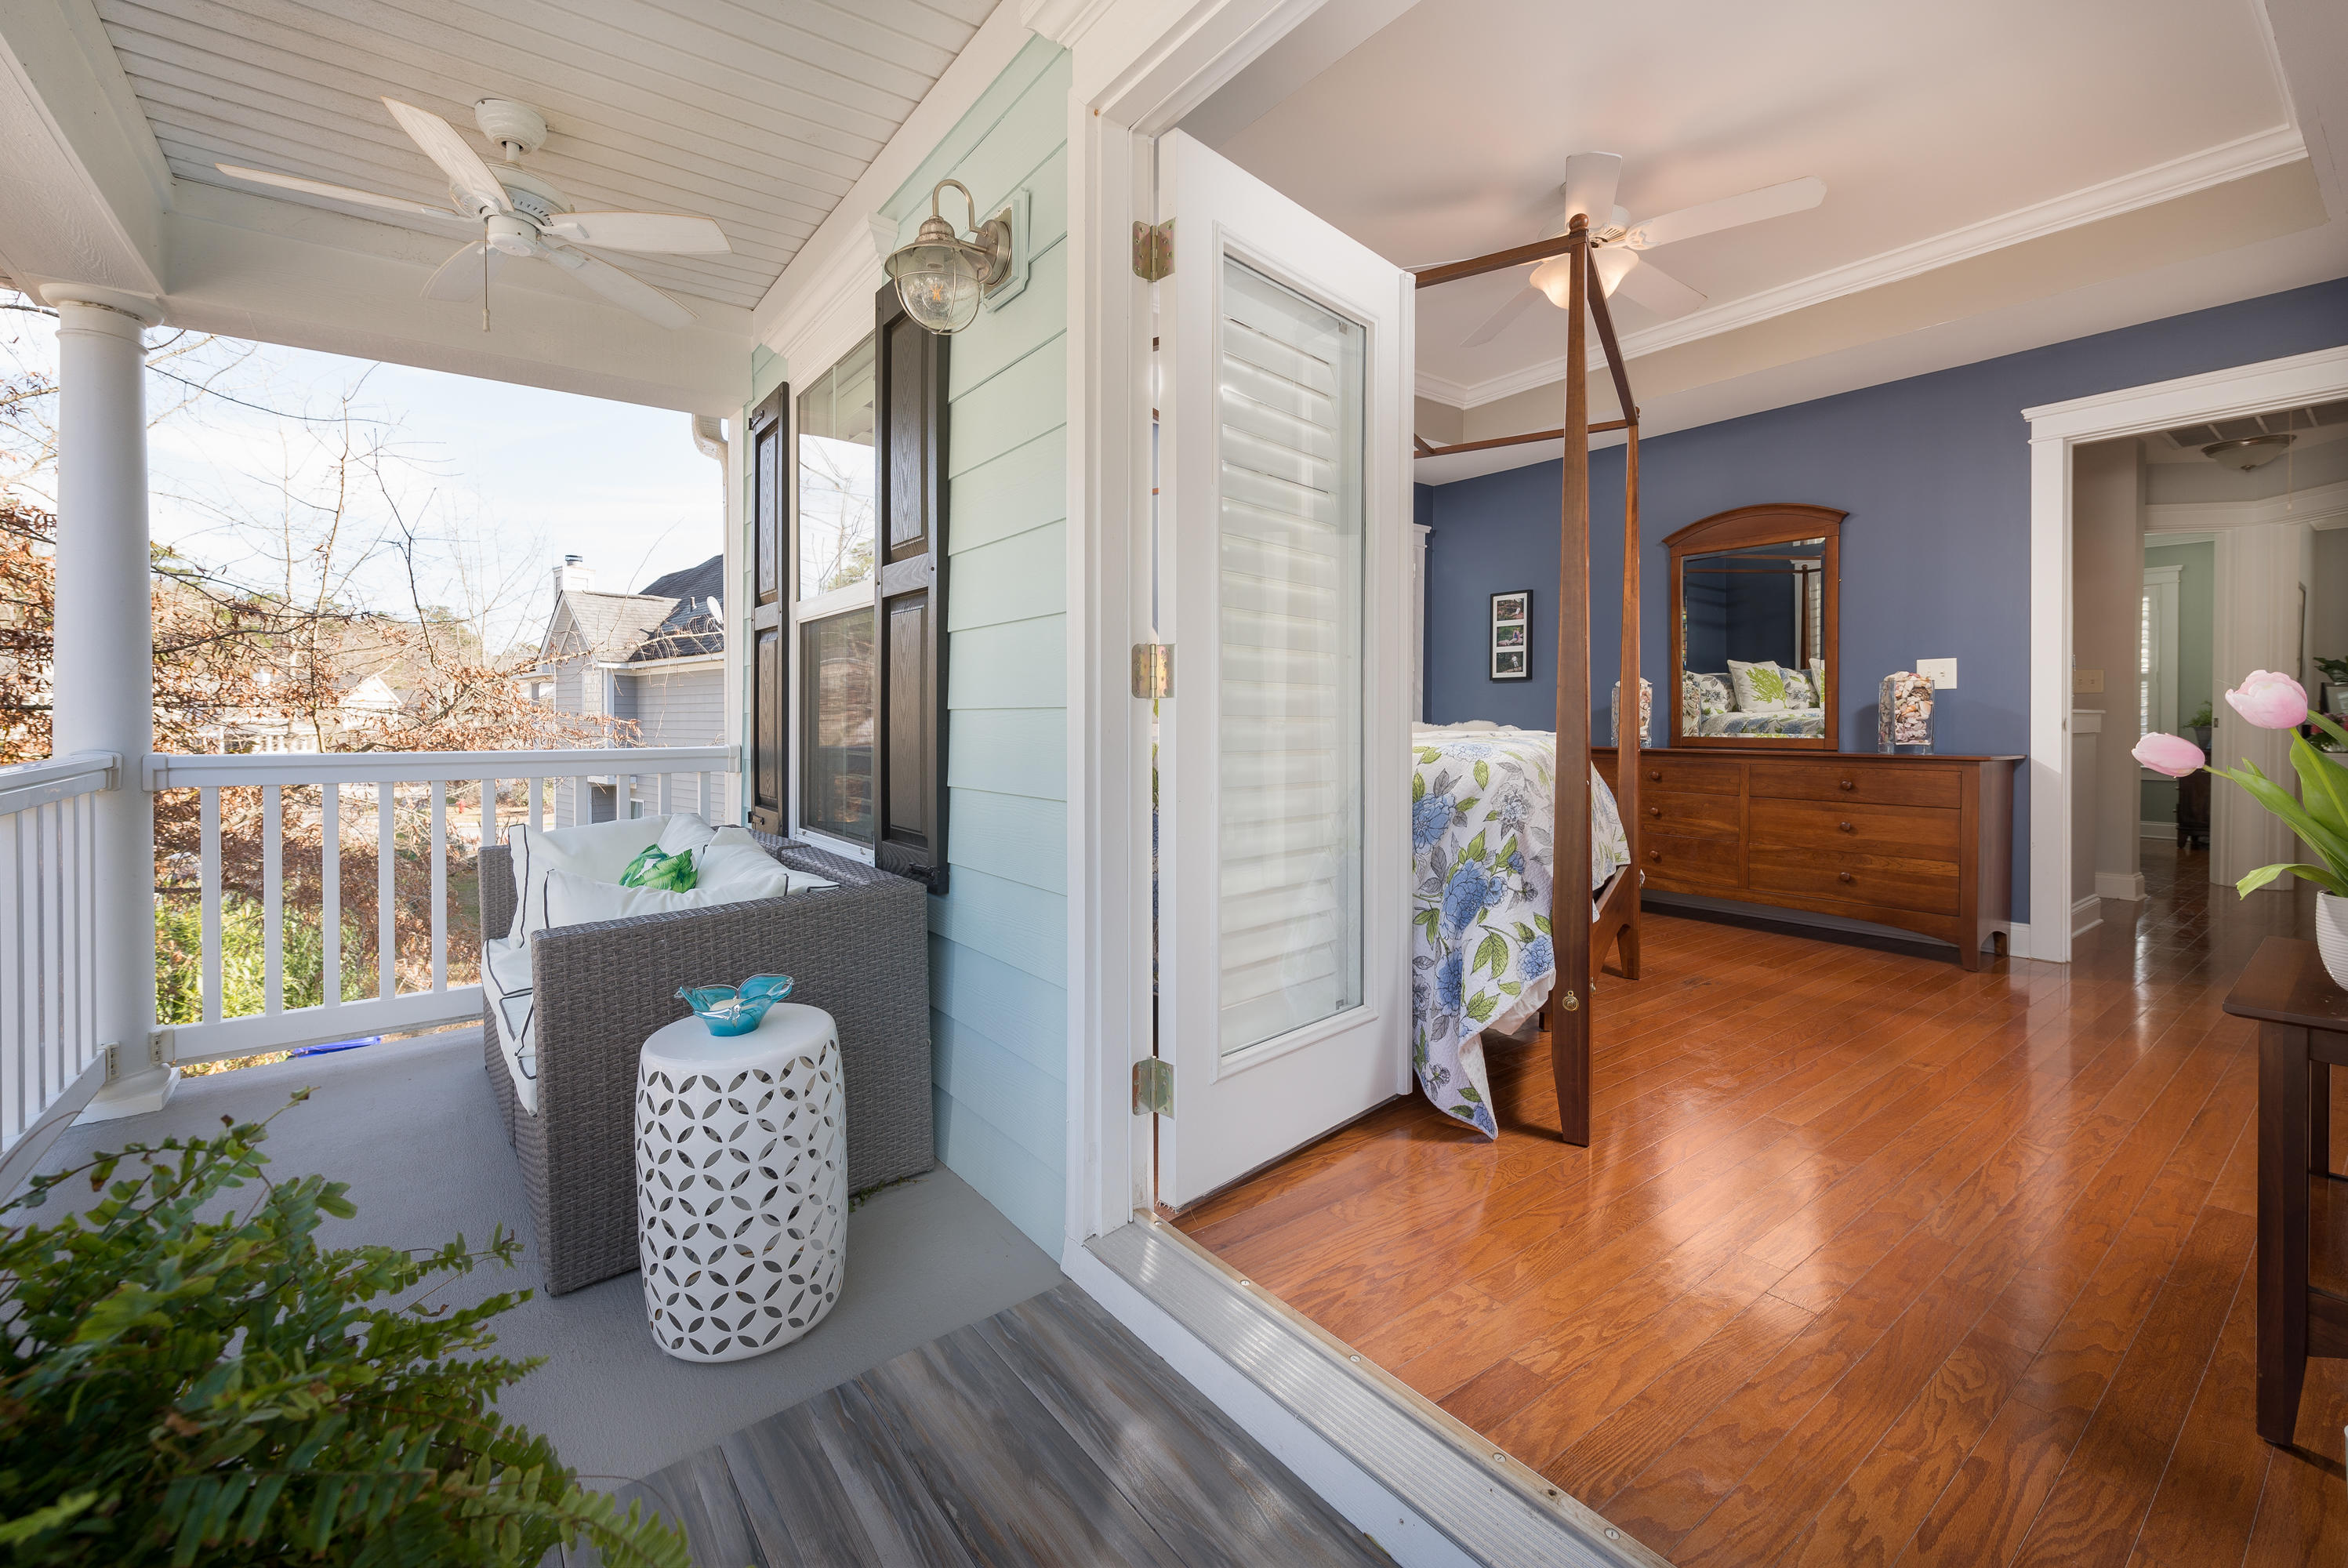 Carol Oaks Homes For Sale - 2813 Caitlins, Mount Pleasant, SC - 38